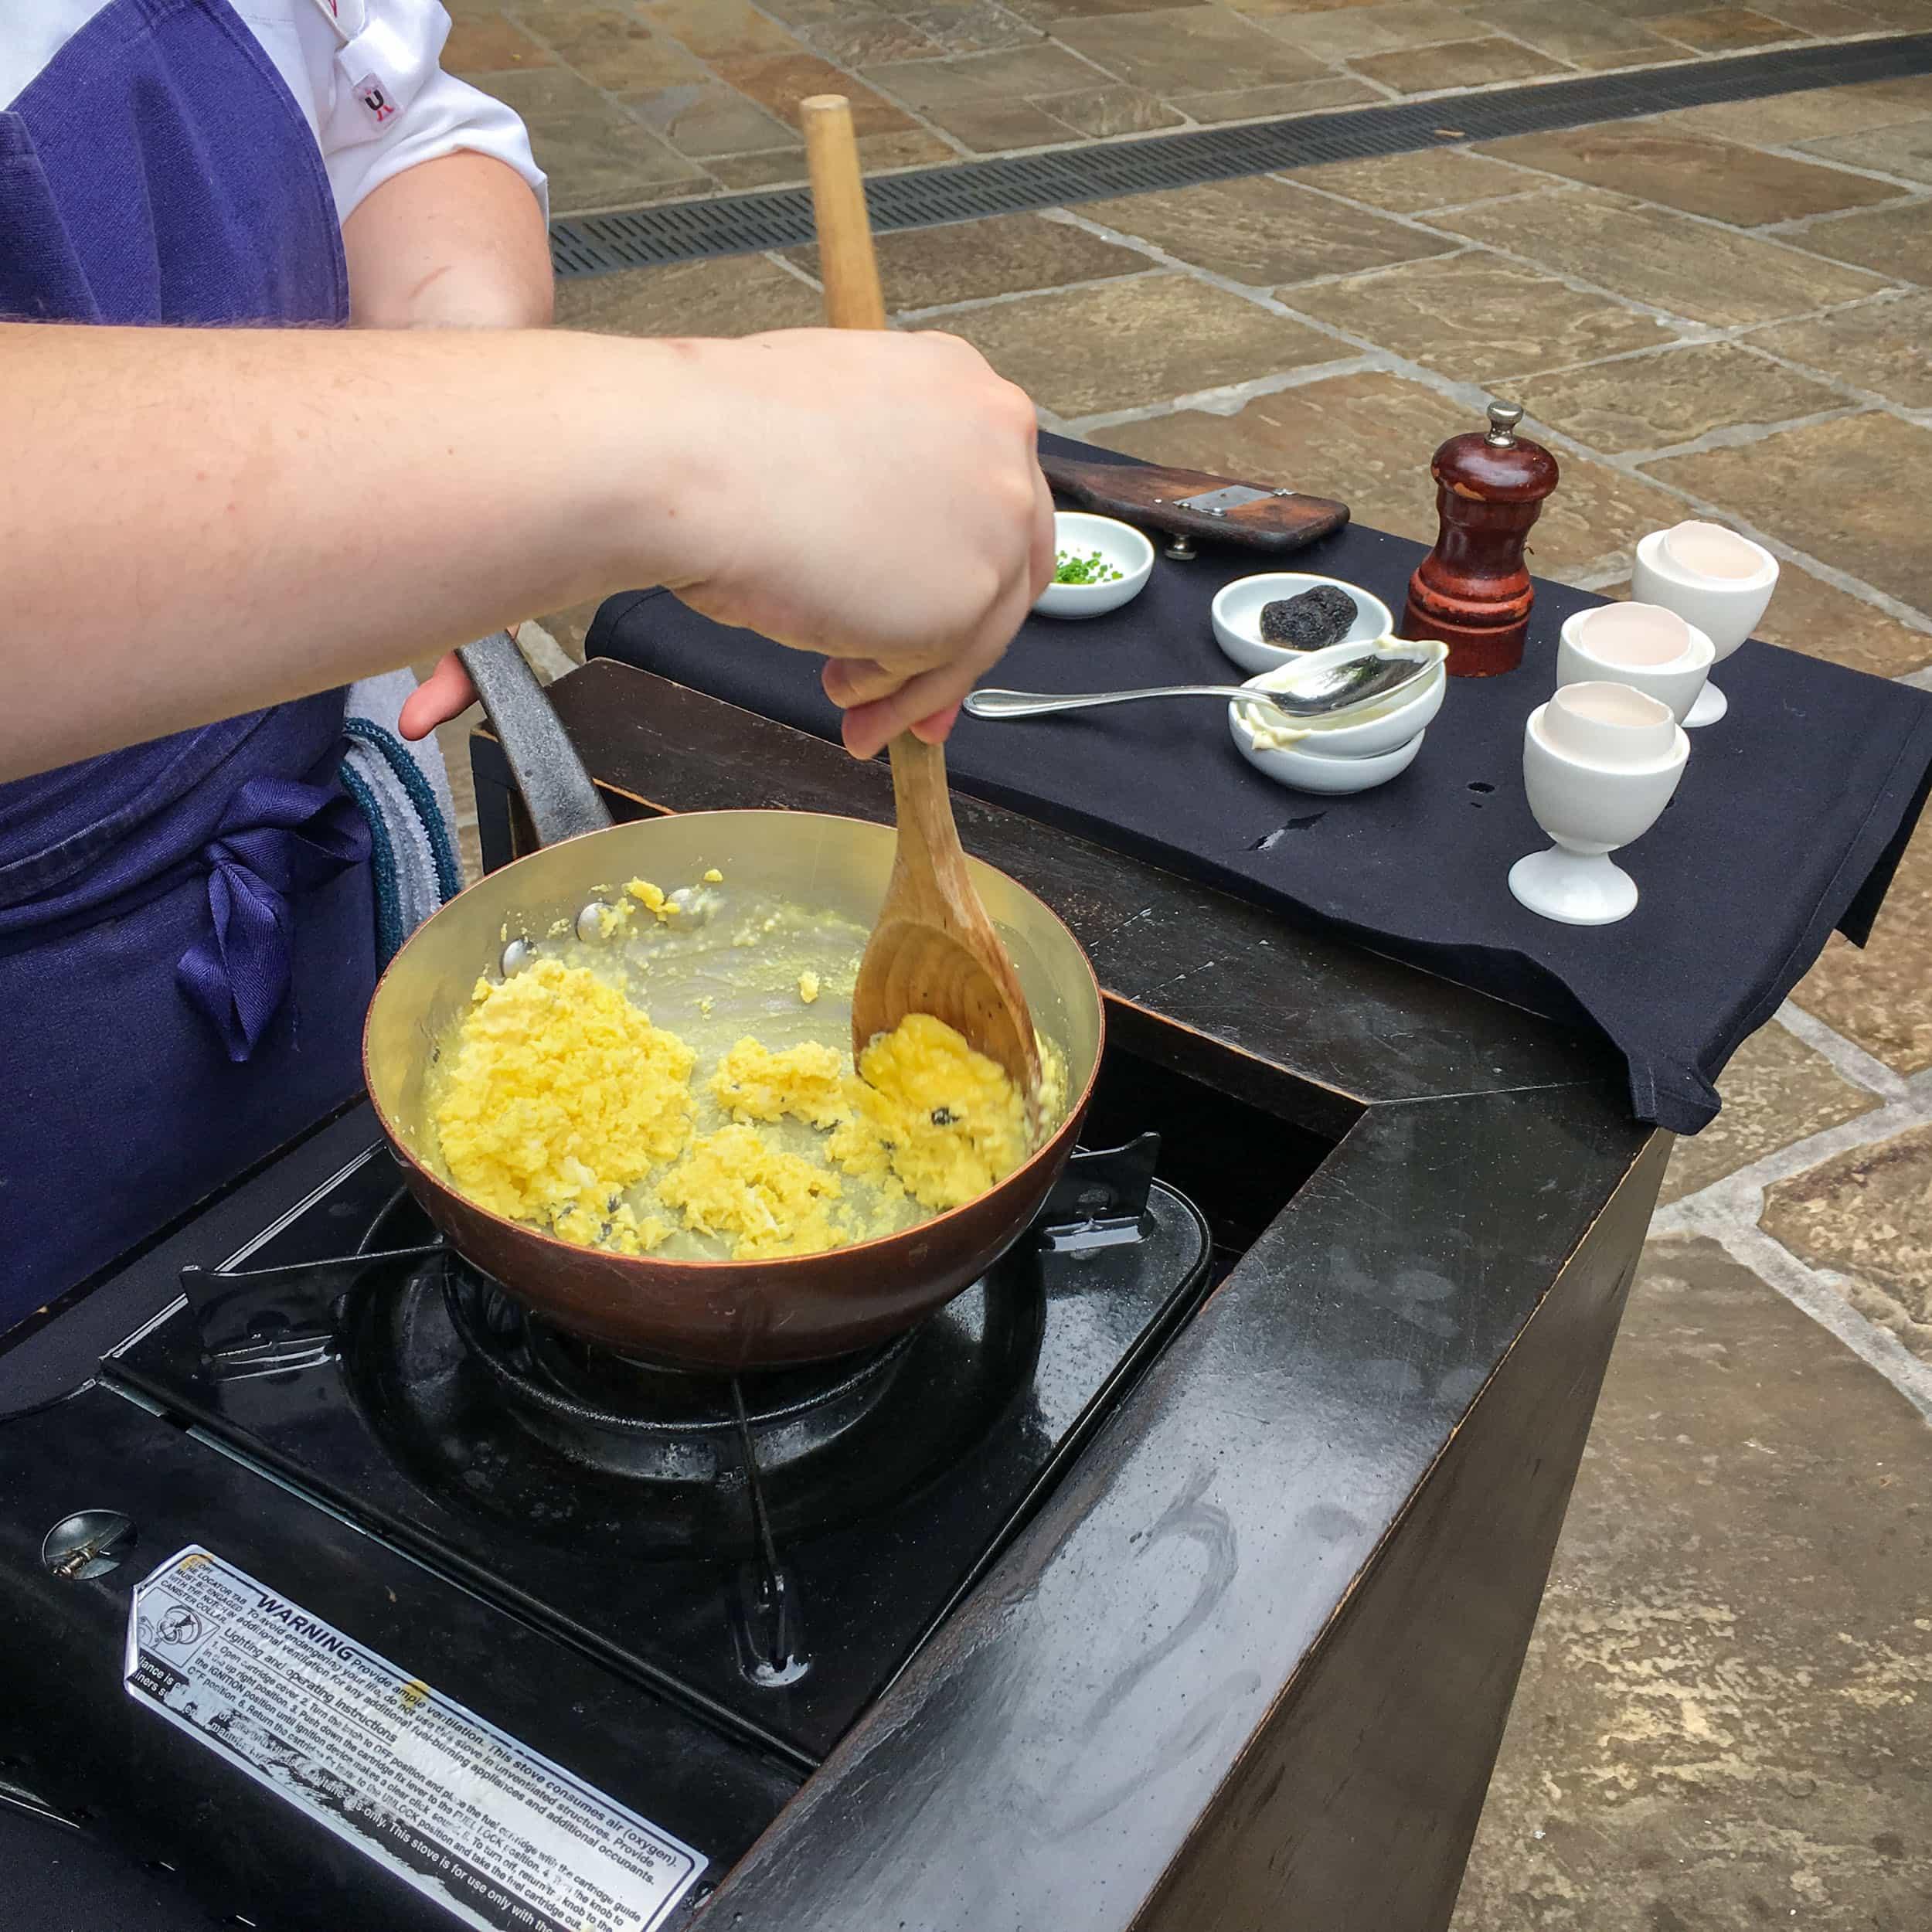 Scrambled eggs prepared tableside